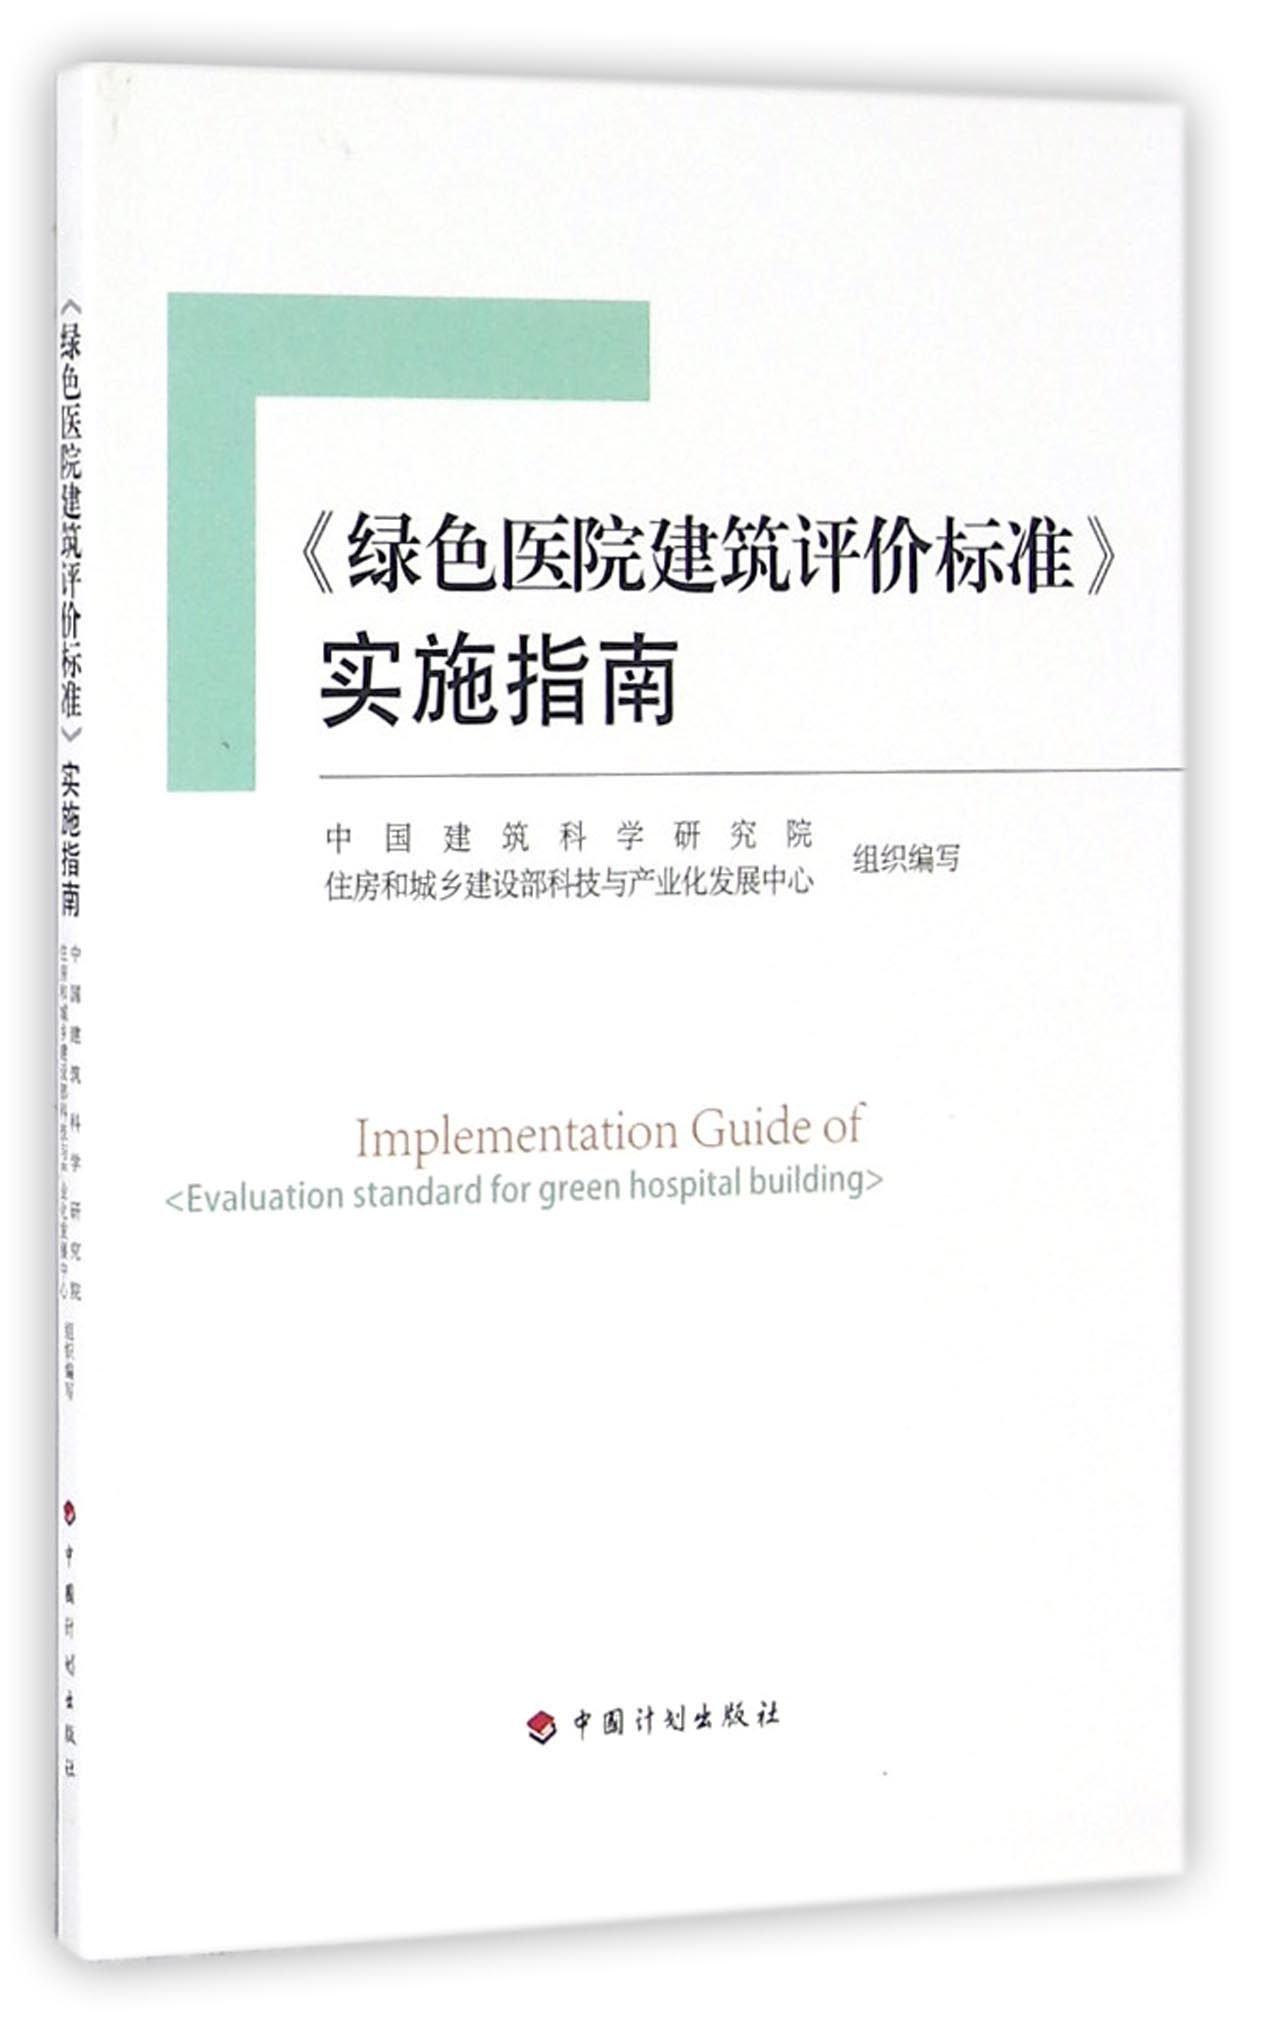 Download 绿色医院建筑评价标准实施指南 PDF